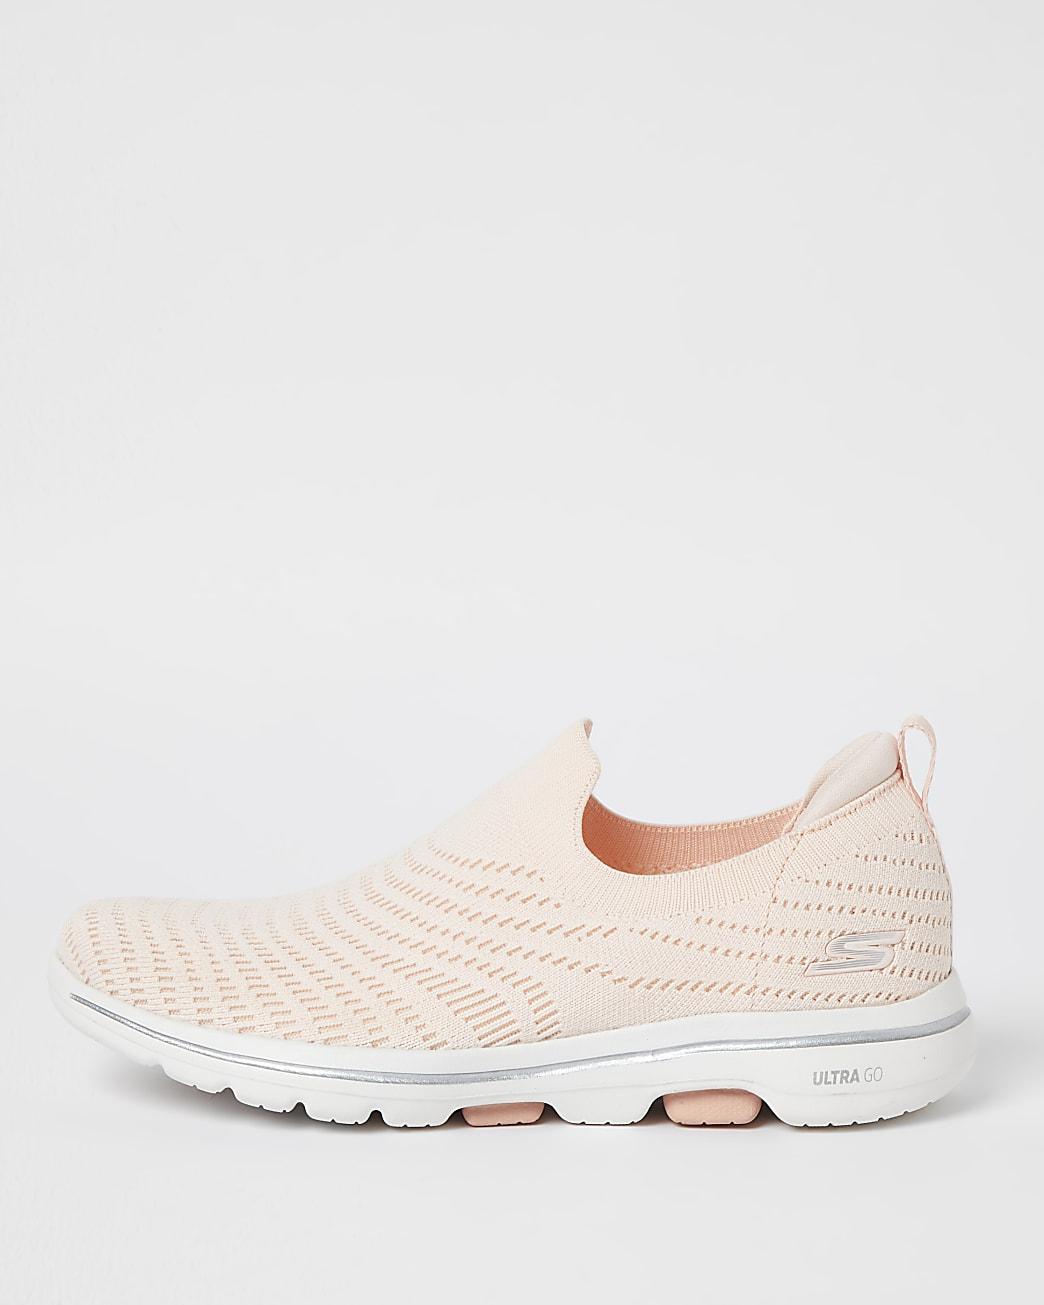 Skechers pink slip on trainers